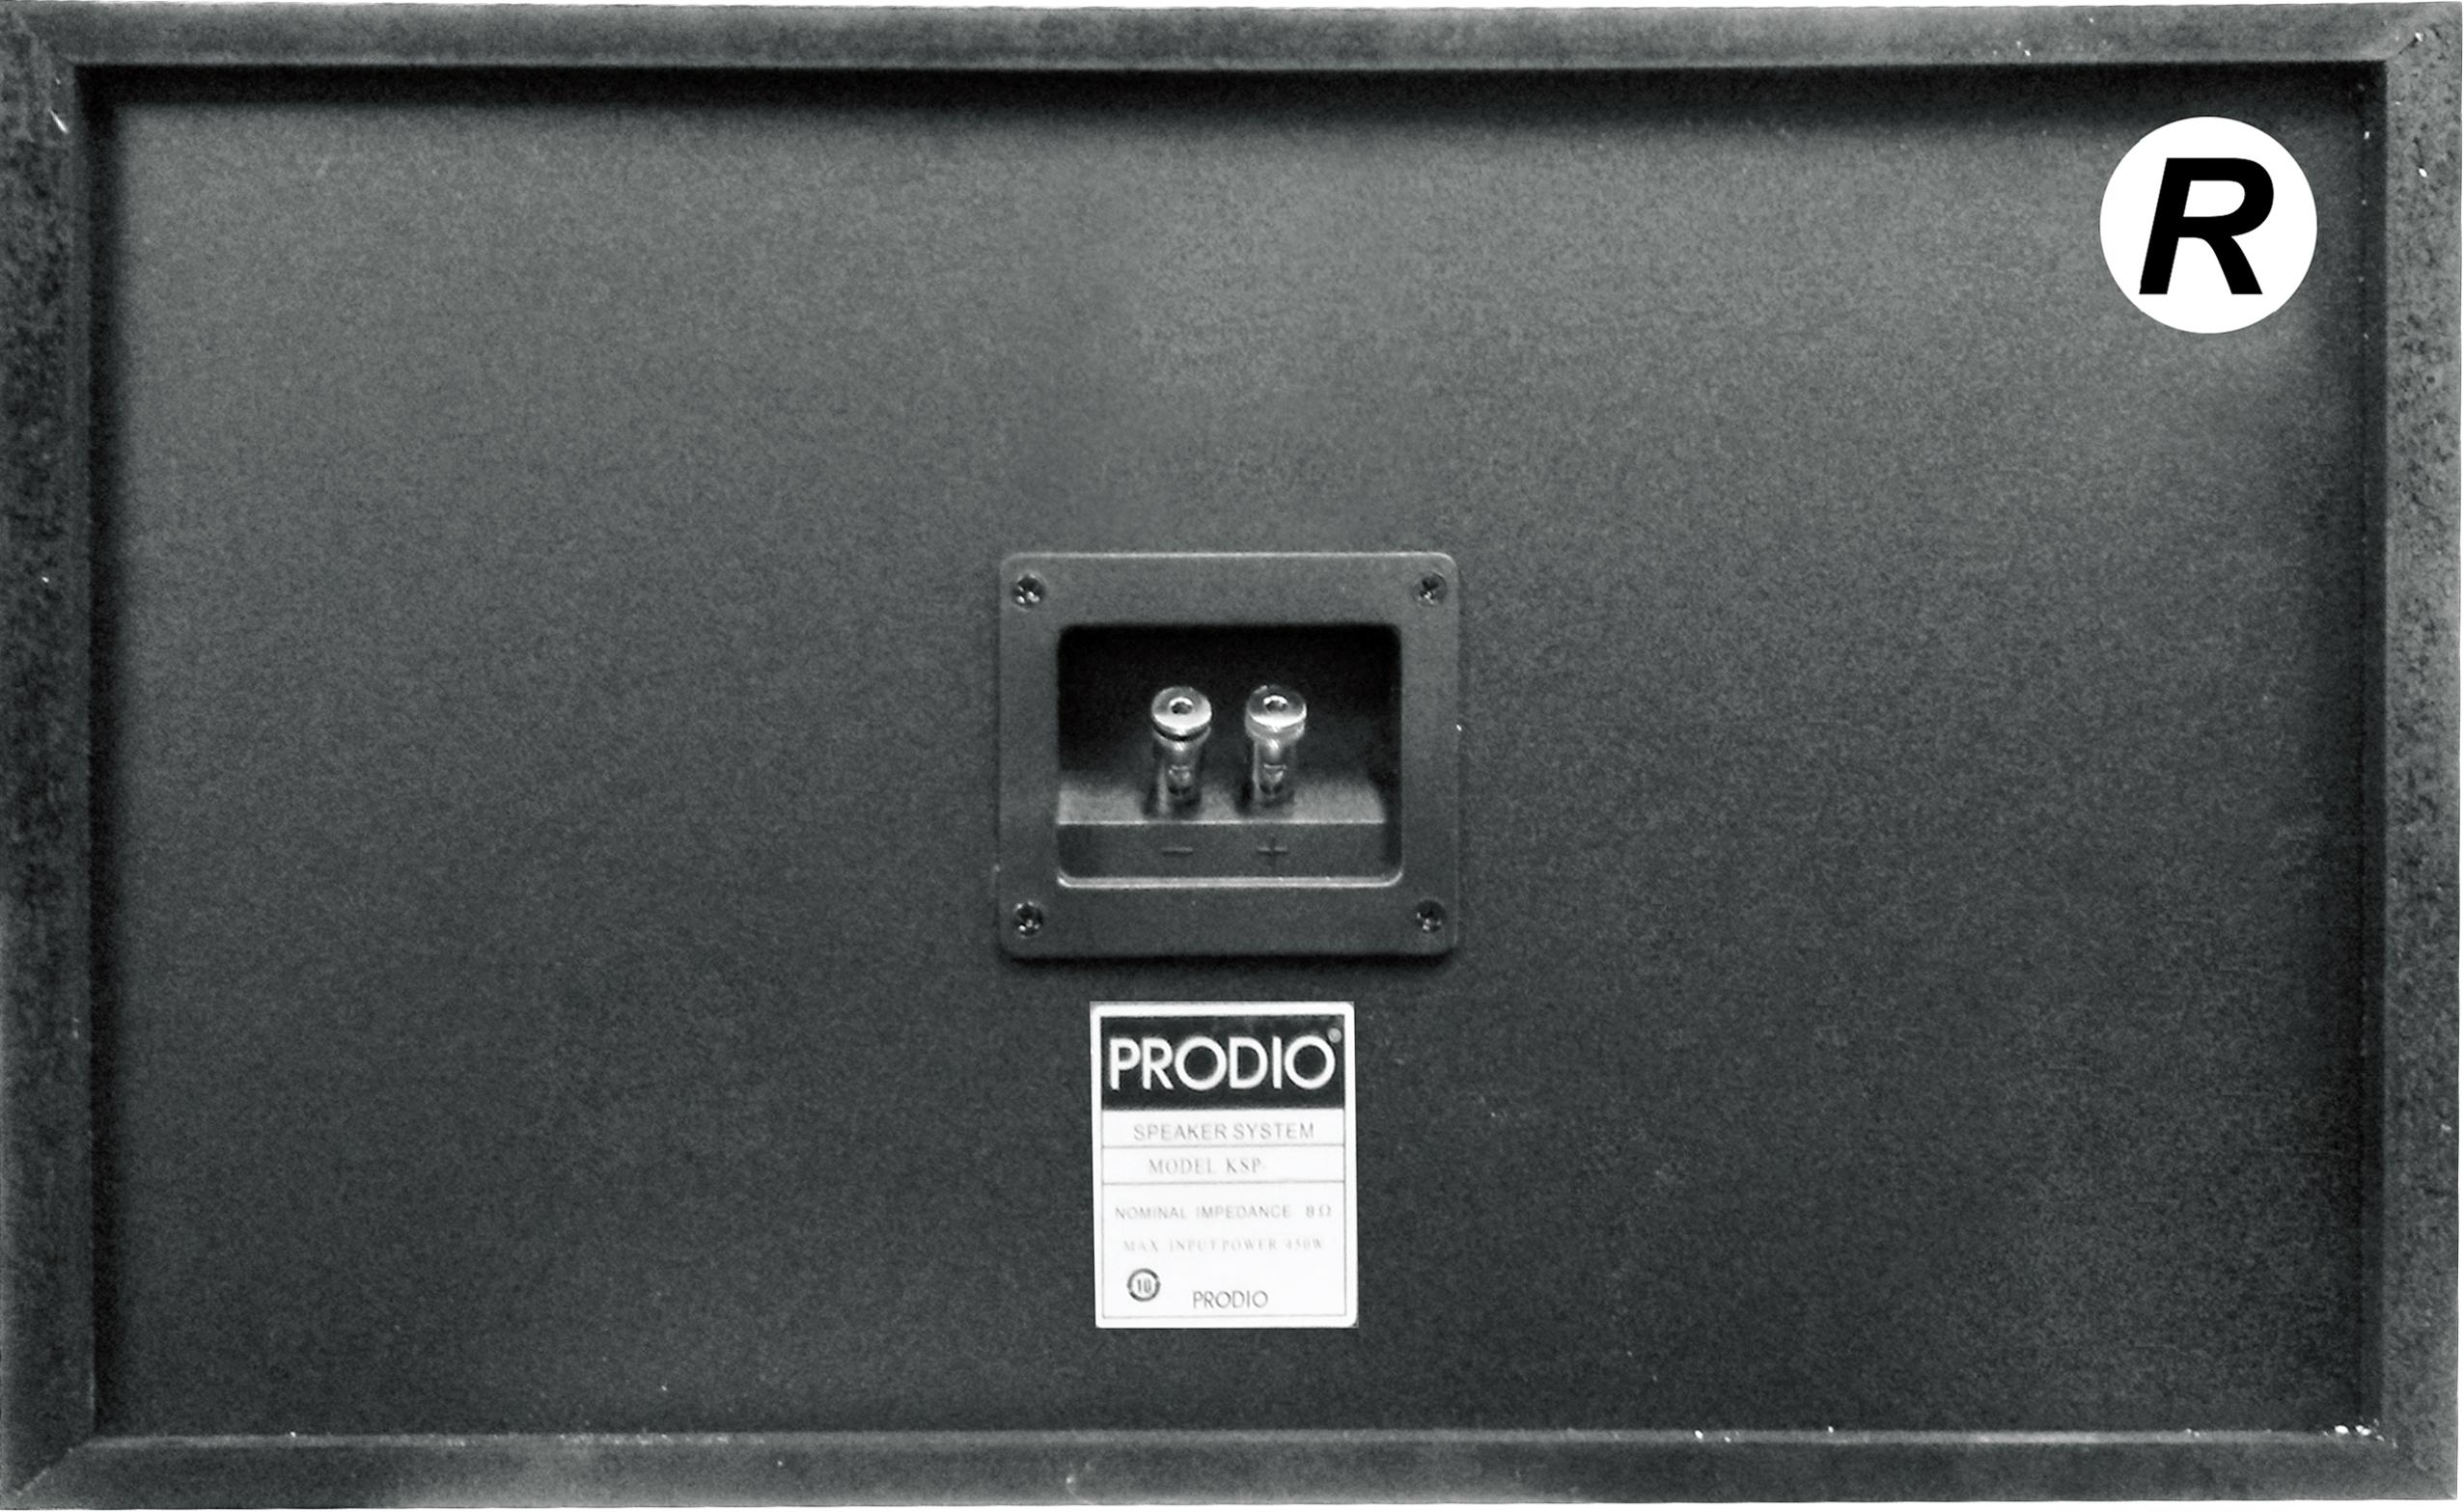 Loa Karaoke PRODIO KSP-490 | Hàng nhập khẩu